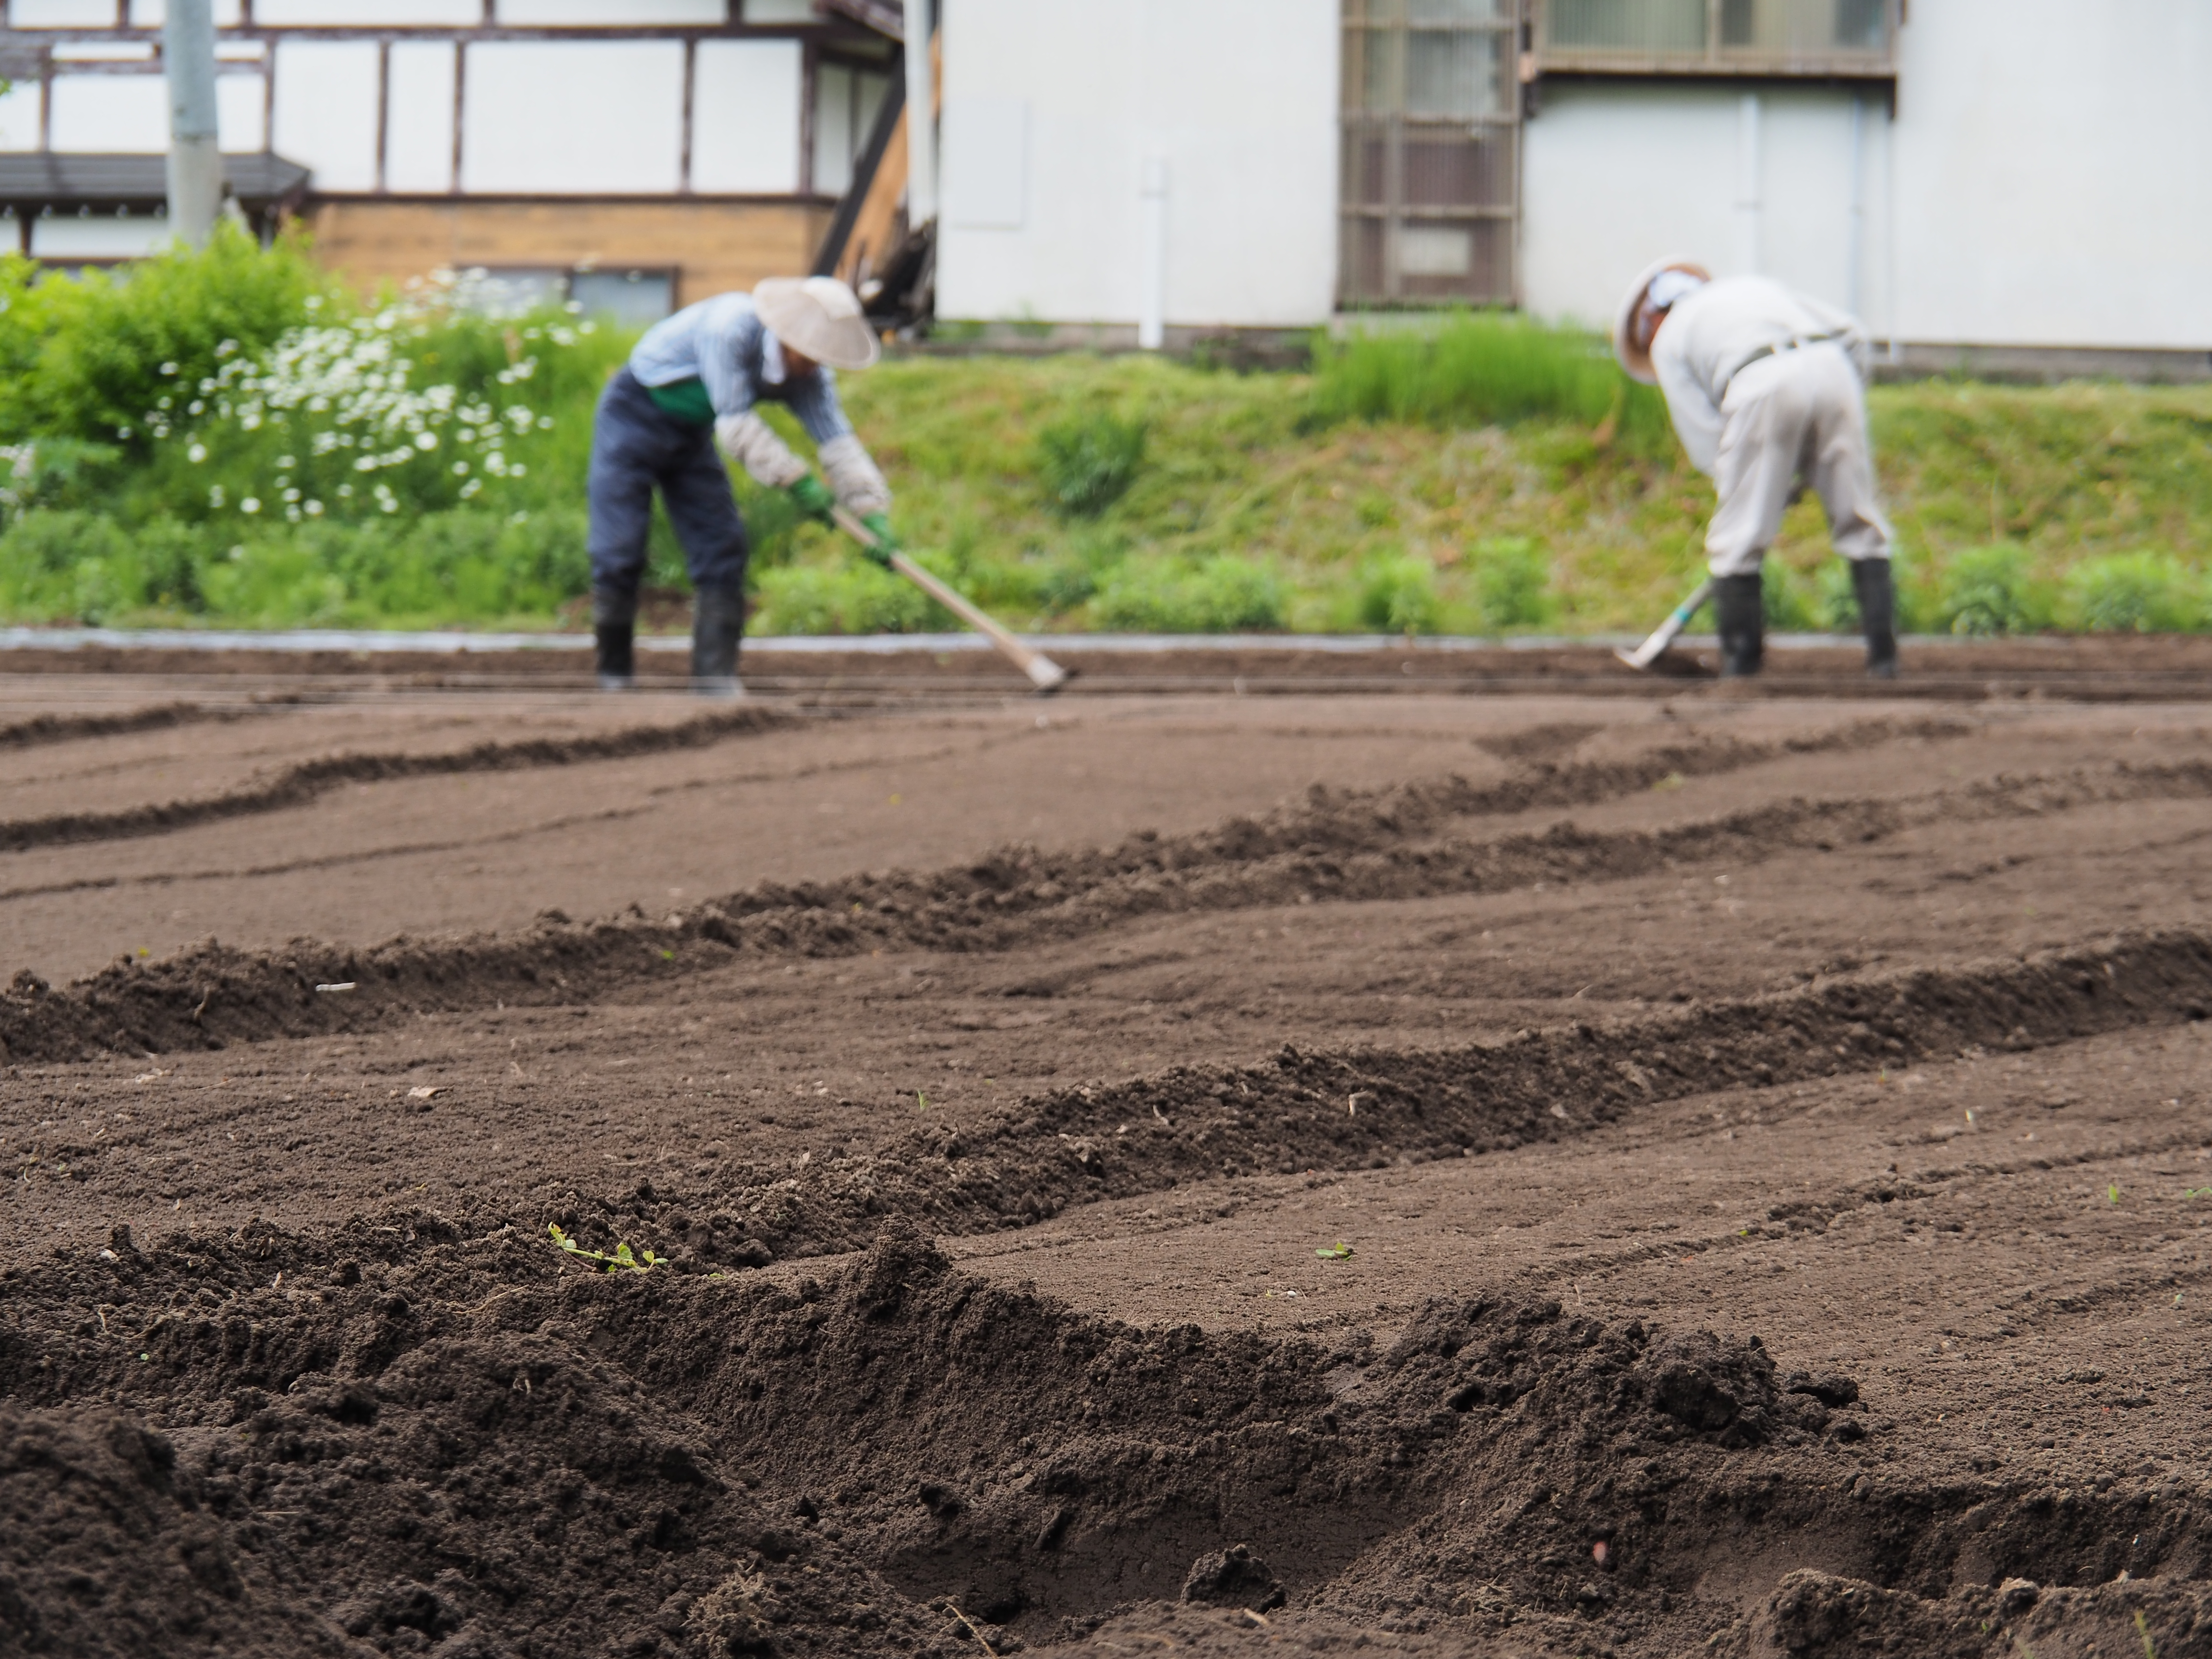 P6170007 - 山形県戸沢村での農業イベント